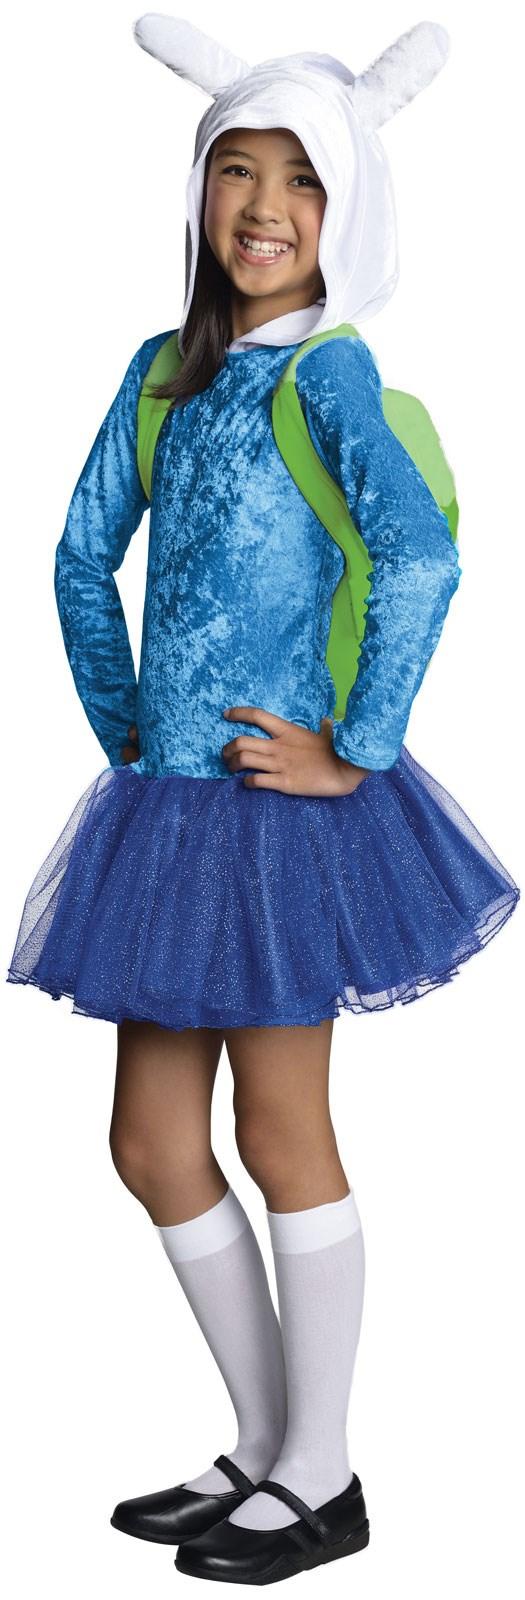 Adventure Time - Girls Fionna Costume